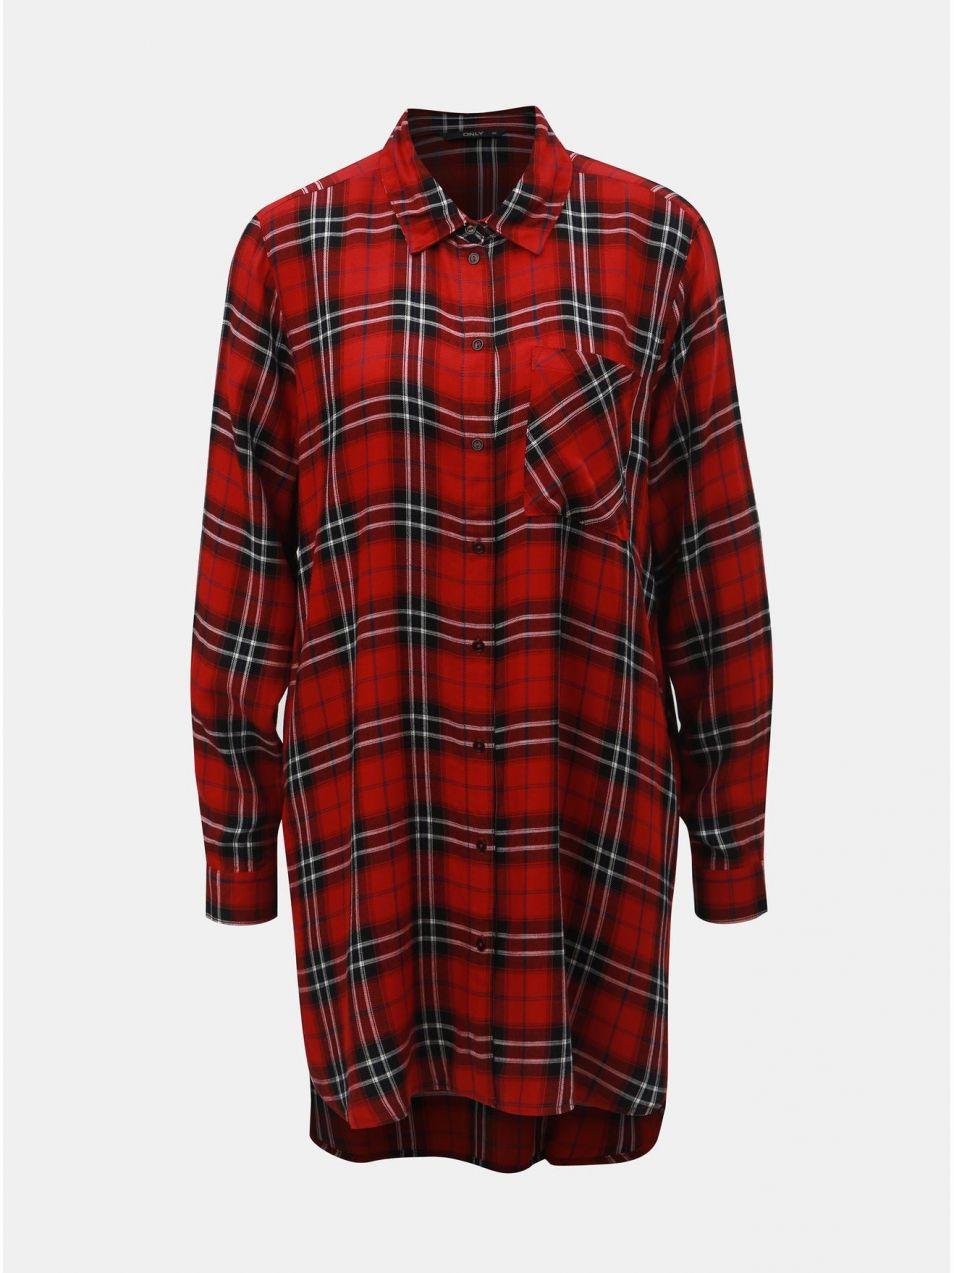 fe27da0119ff Čierno–červená dlhá károvaná košeľa ONLY značky ONLY - Lovely.sk